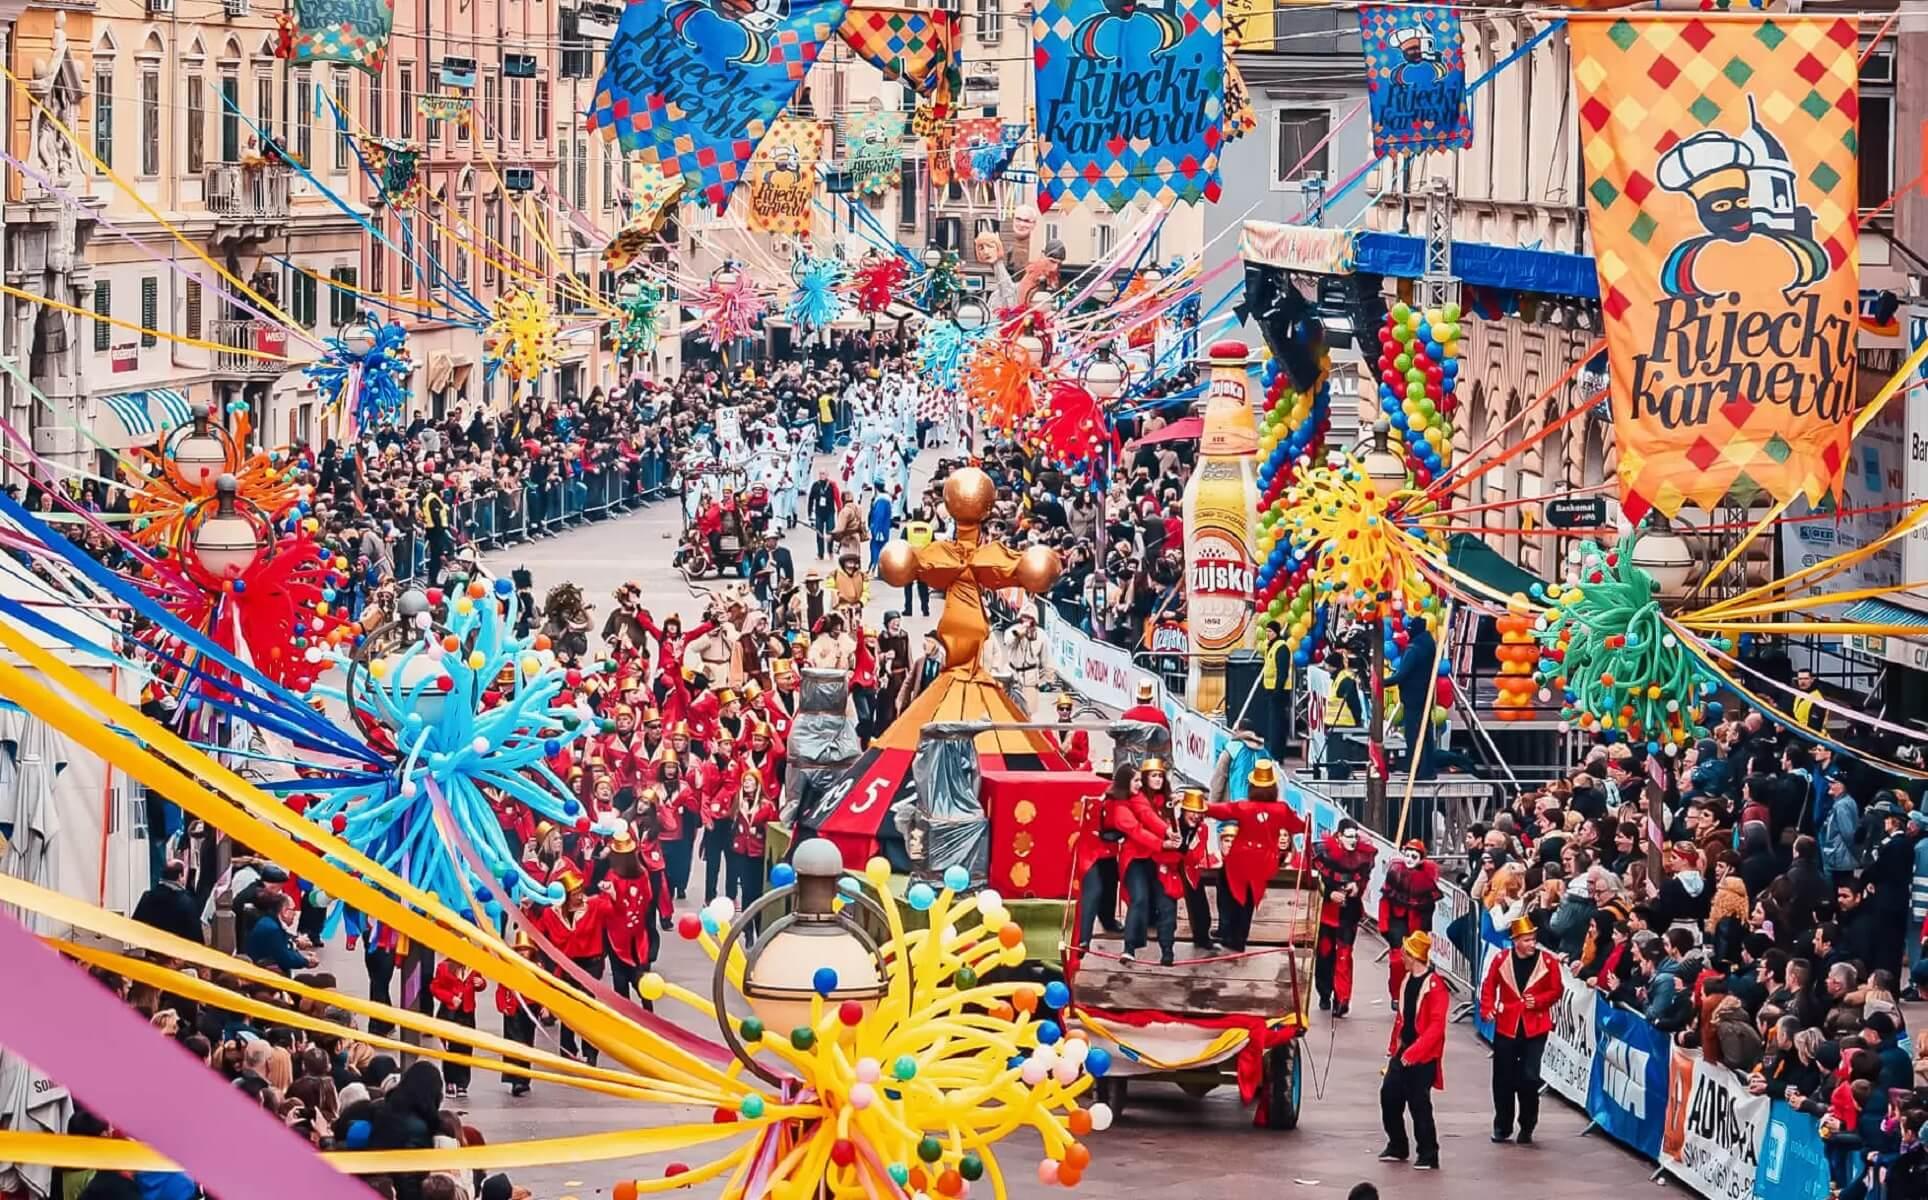 Carnival-in-Rijeka-Croatia